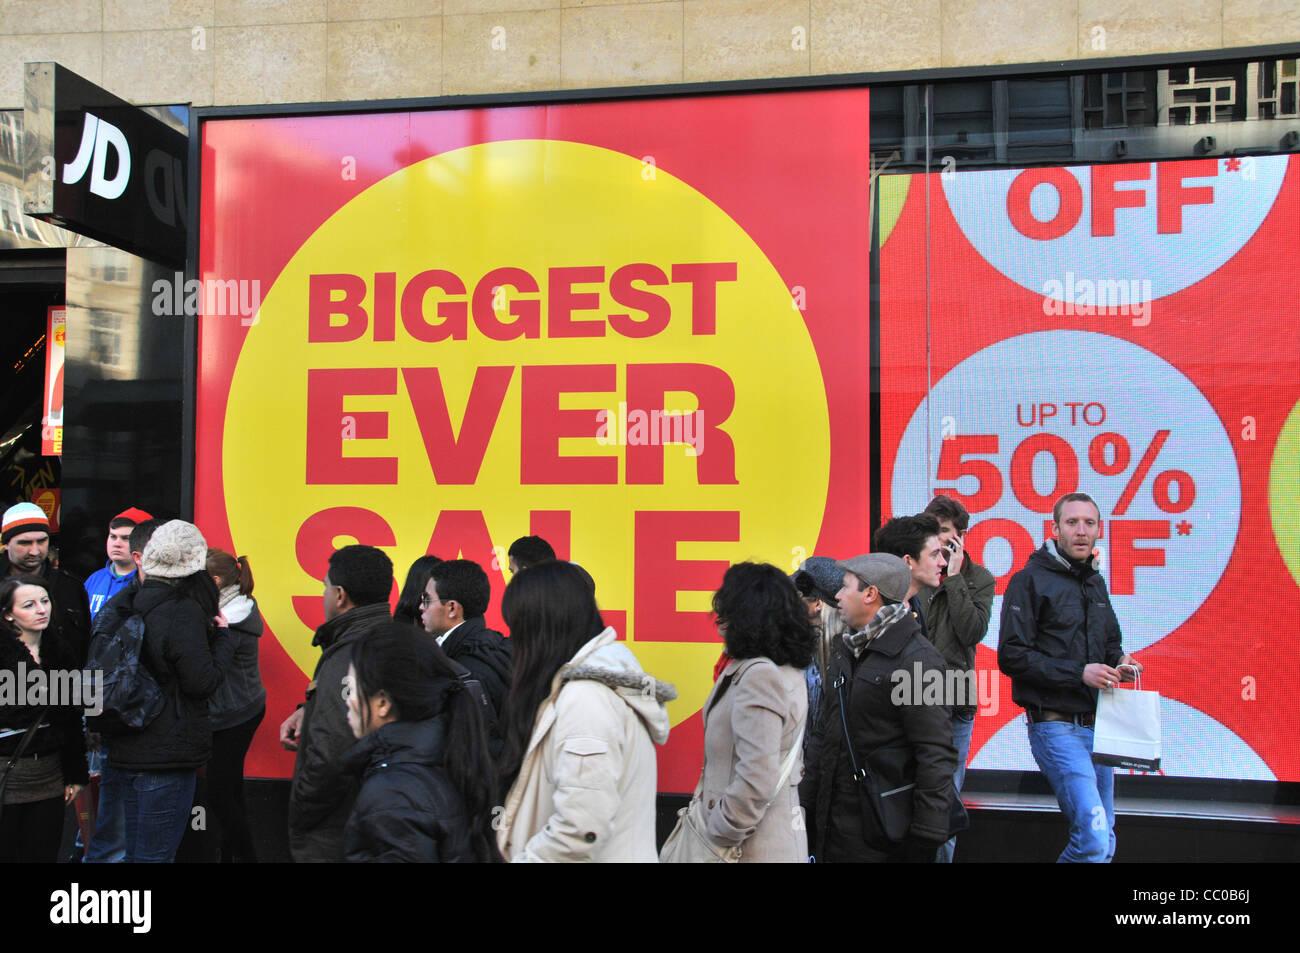 JD sports January Sales London Retail sales sale signs Oxford street London  2012 - Stock Image b41866a71